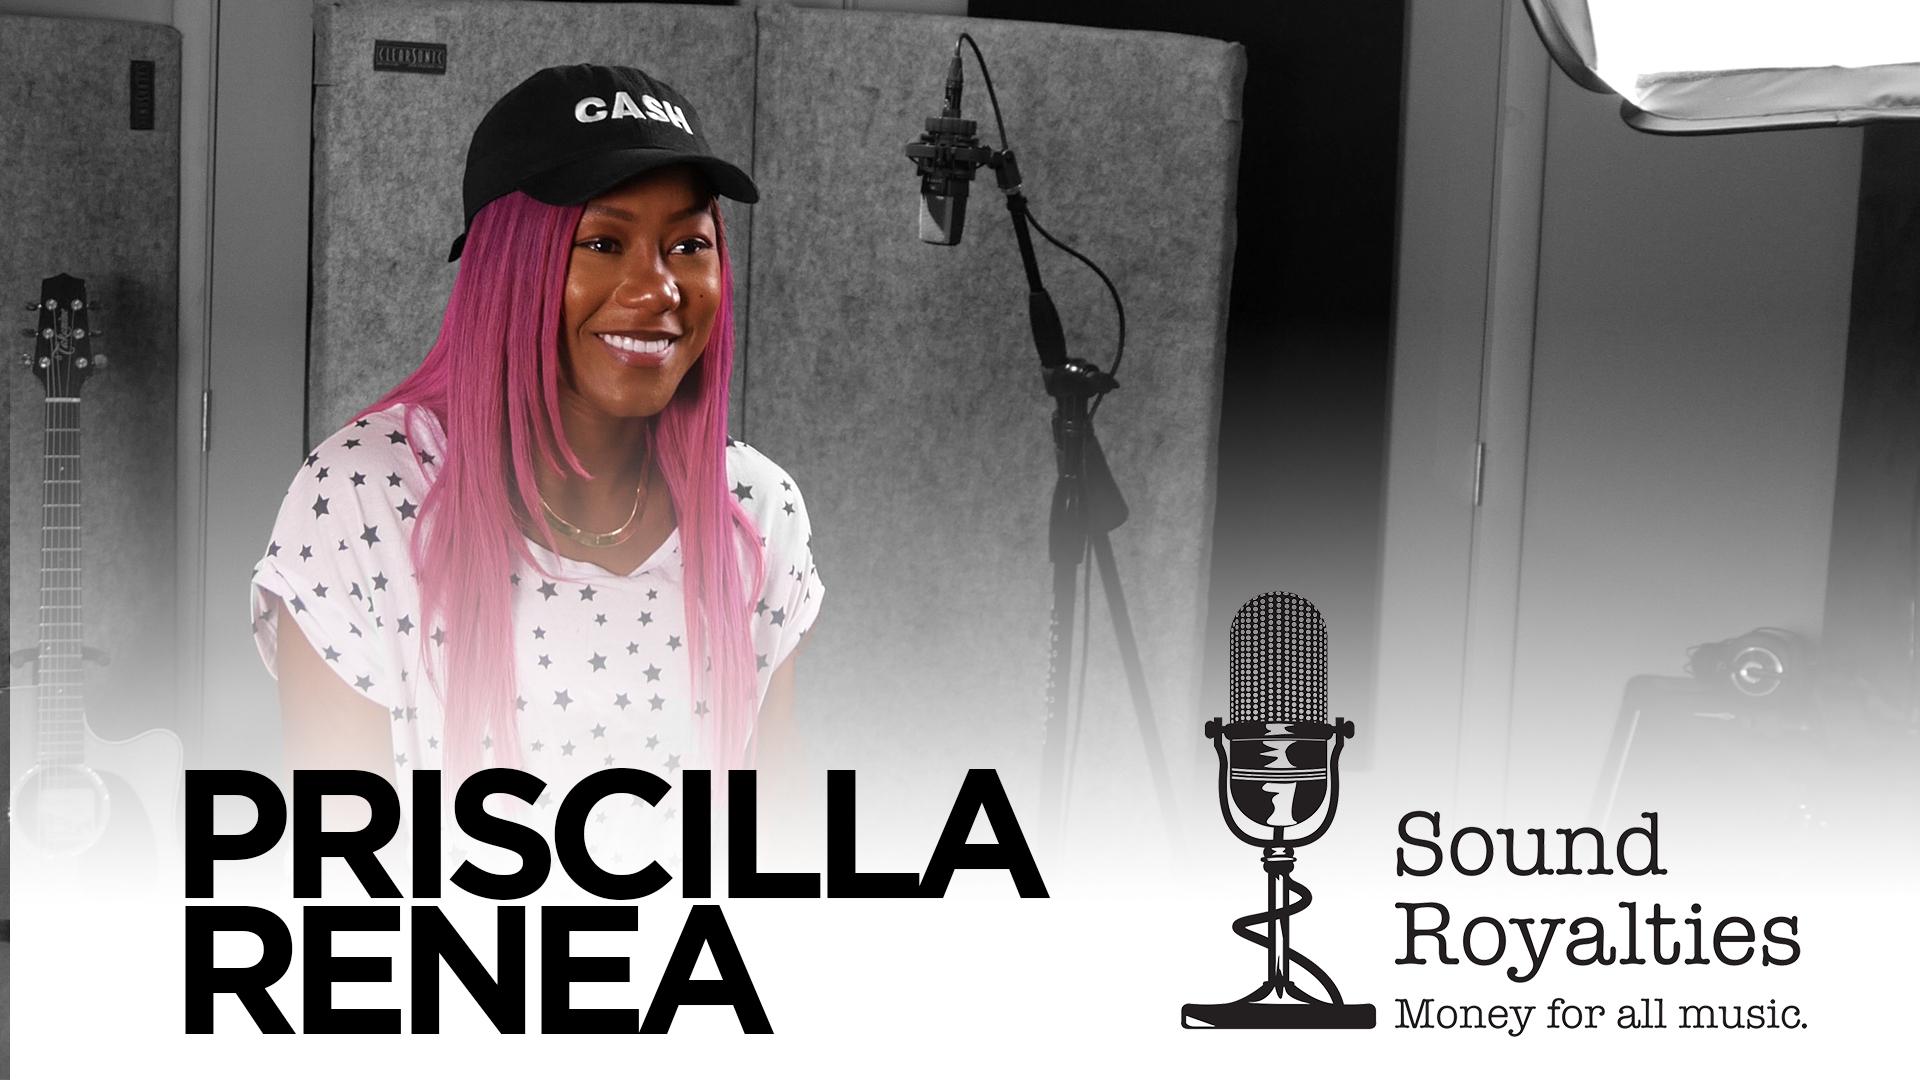 Priscilla Renae <br/>Sound Royalties Testimony